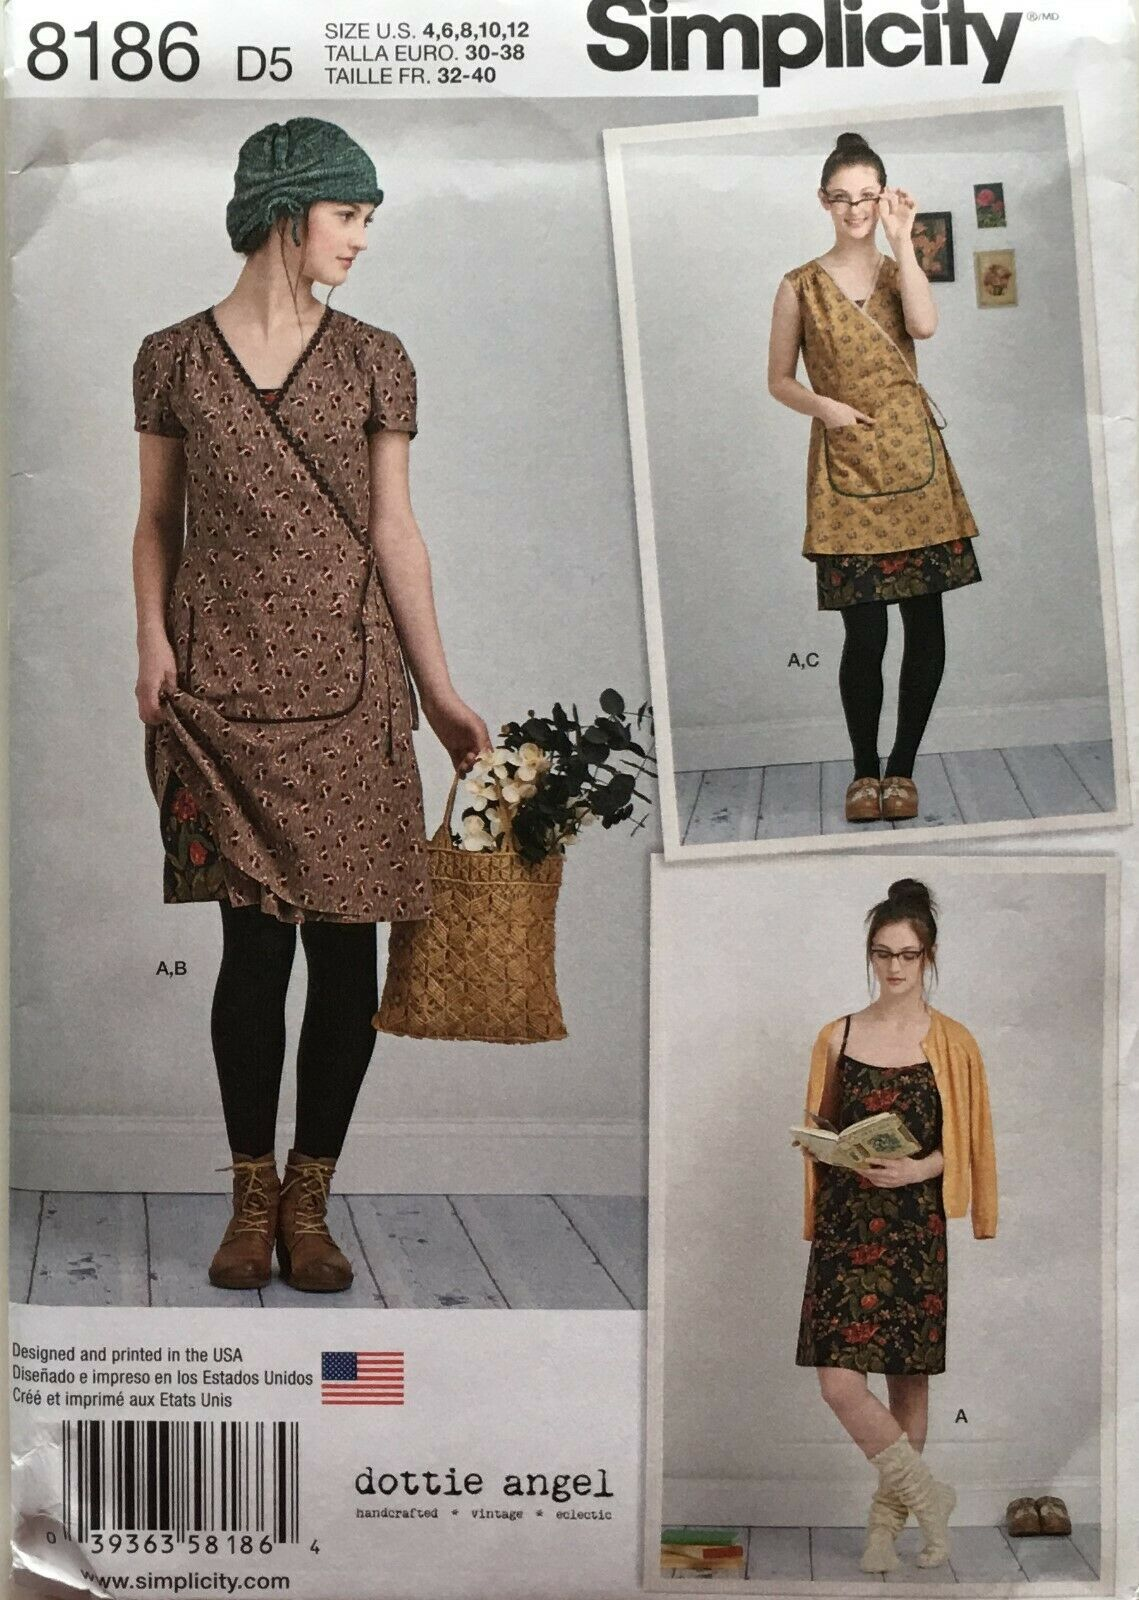 Slip Or Wrap Dress-4-6-8-10-12 Simplicity Dottie Angel Misses/' Slip